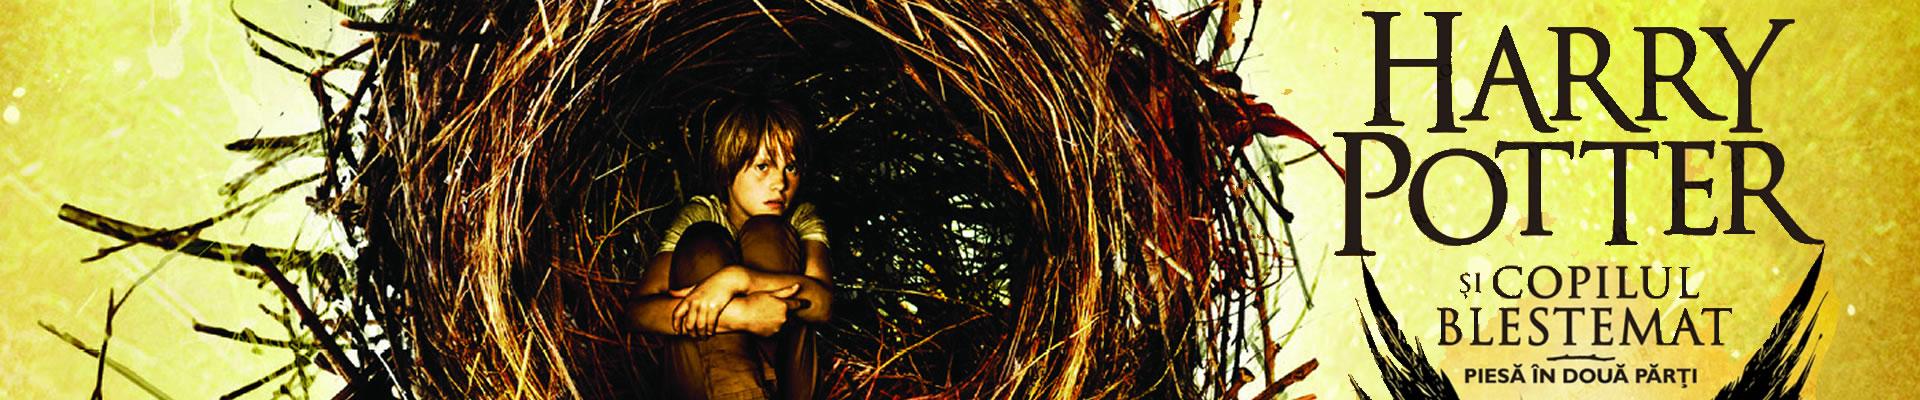 Harry Potter si Copilul Blestemat Editura Arthur